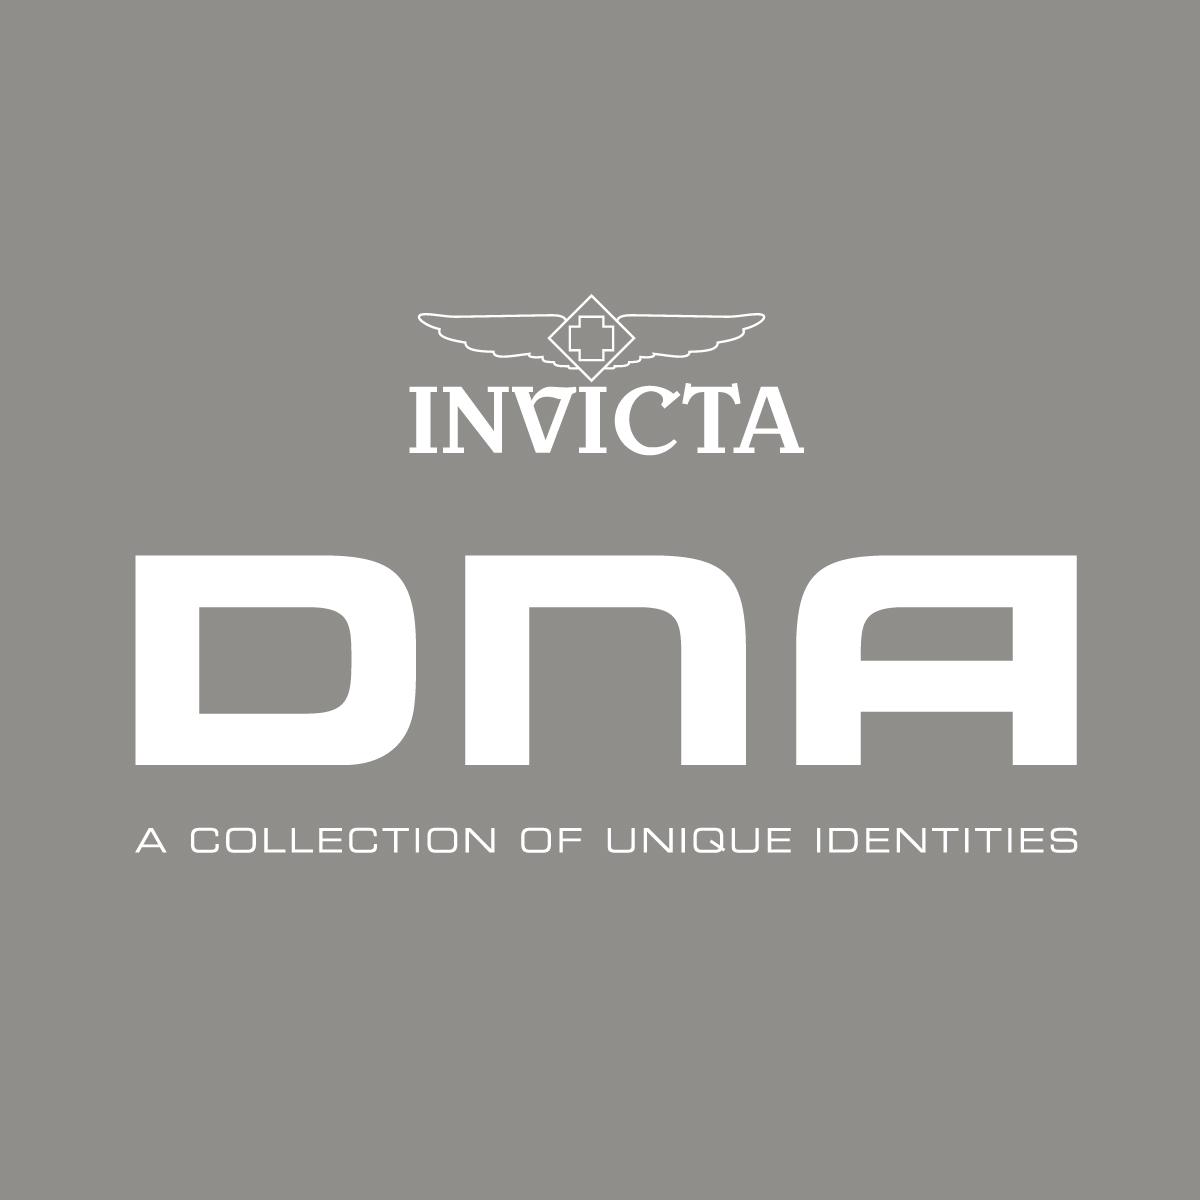 IN-38-DNA-Logo-04-AltColors-CMYK.jpg